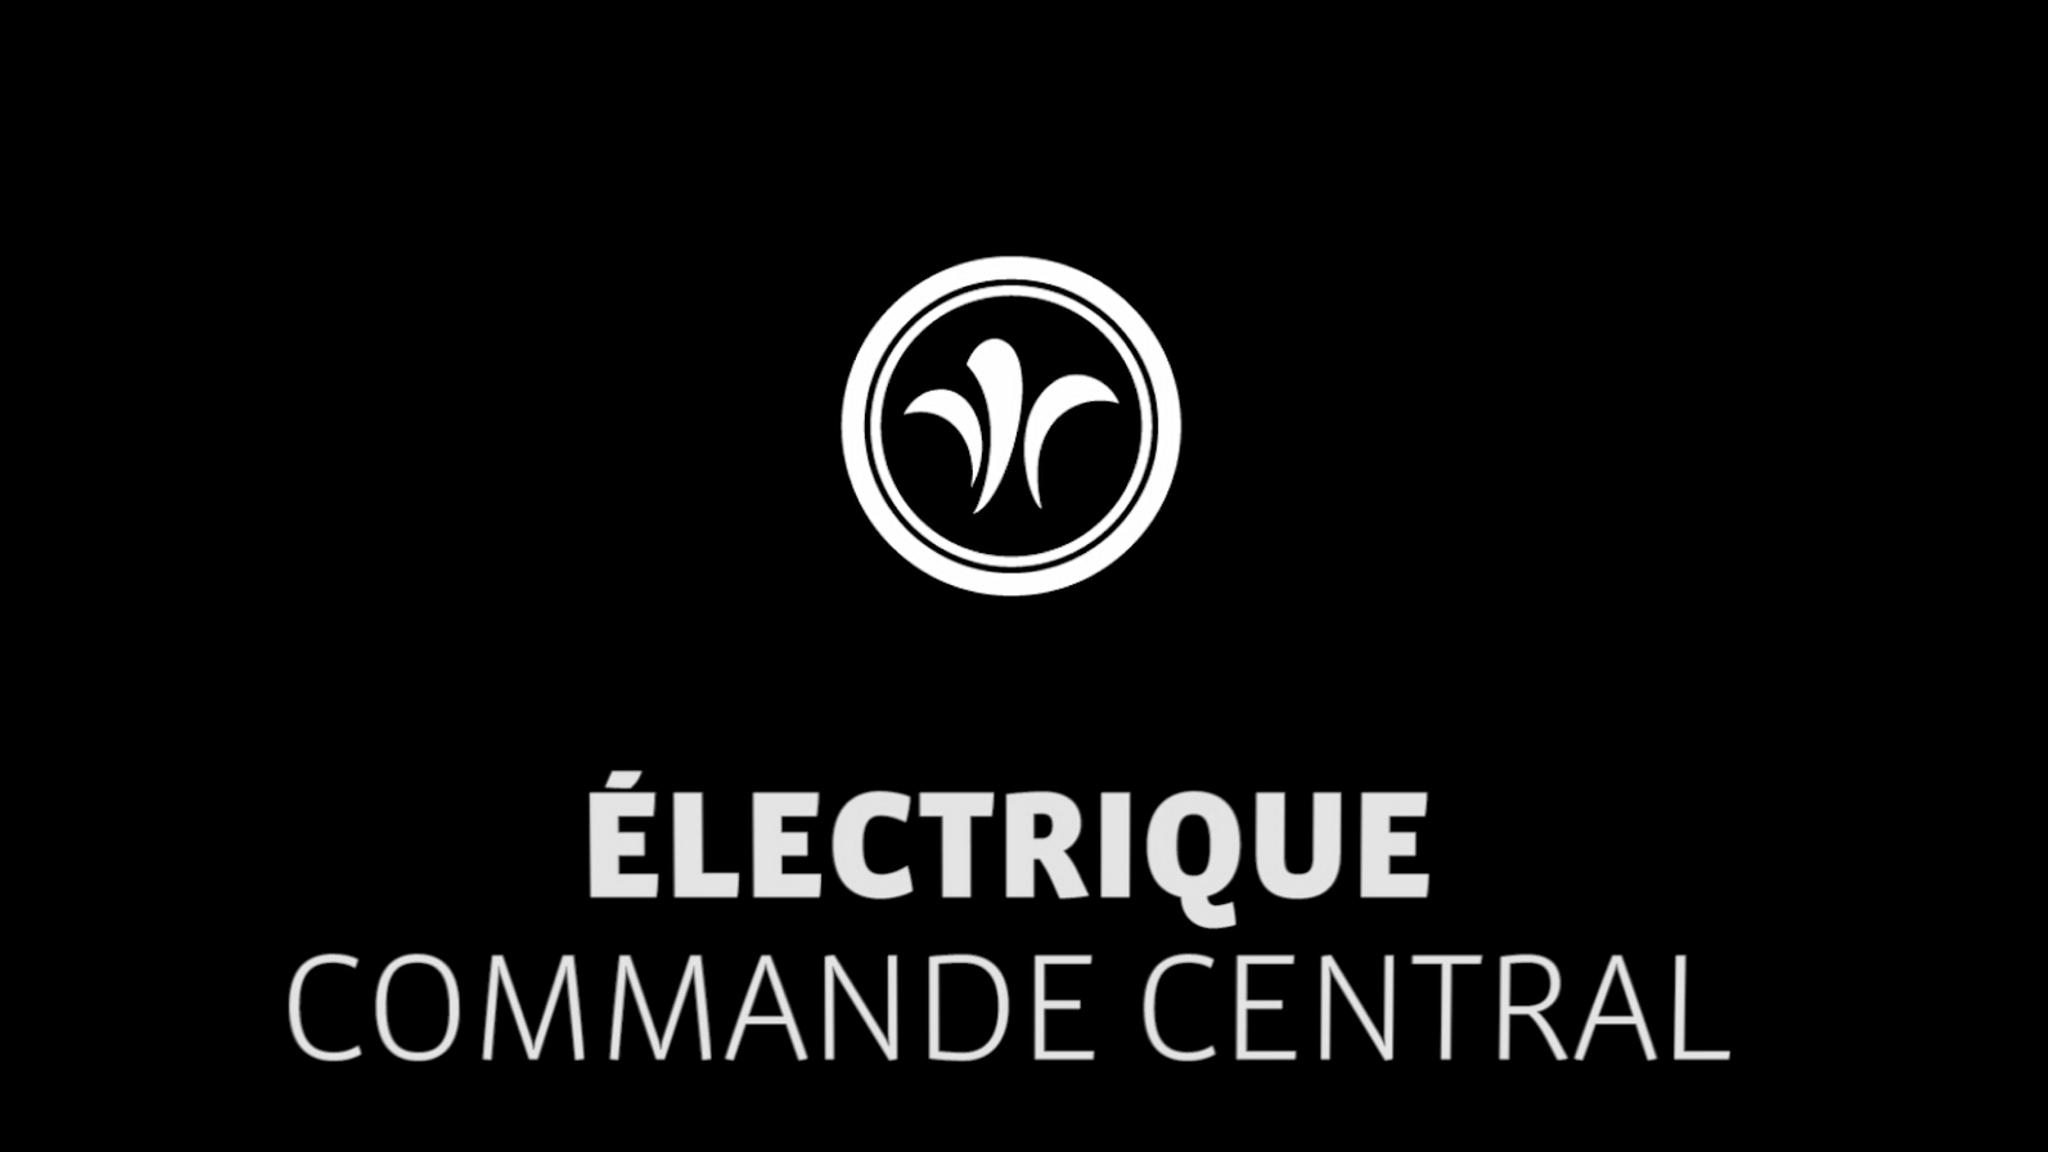 Commande centrale de camping-car // Niesmann+Bischoff - Camping-car de luxe (FLAIR) // 2019 // EL1